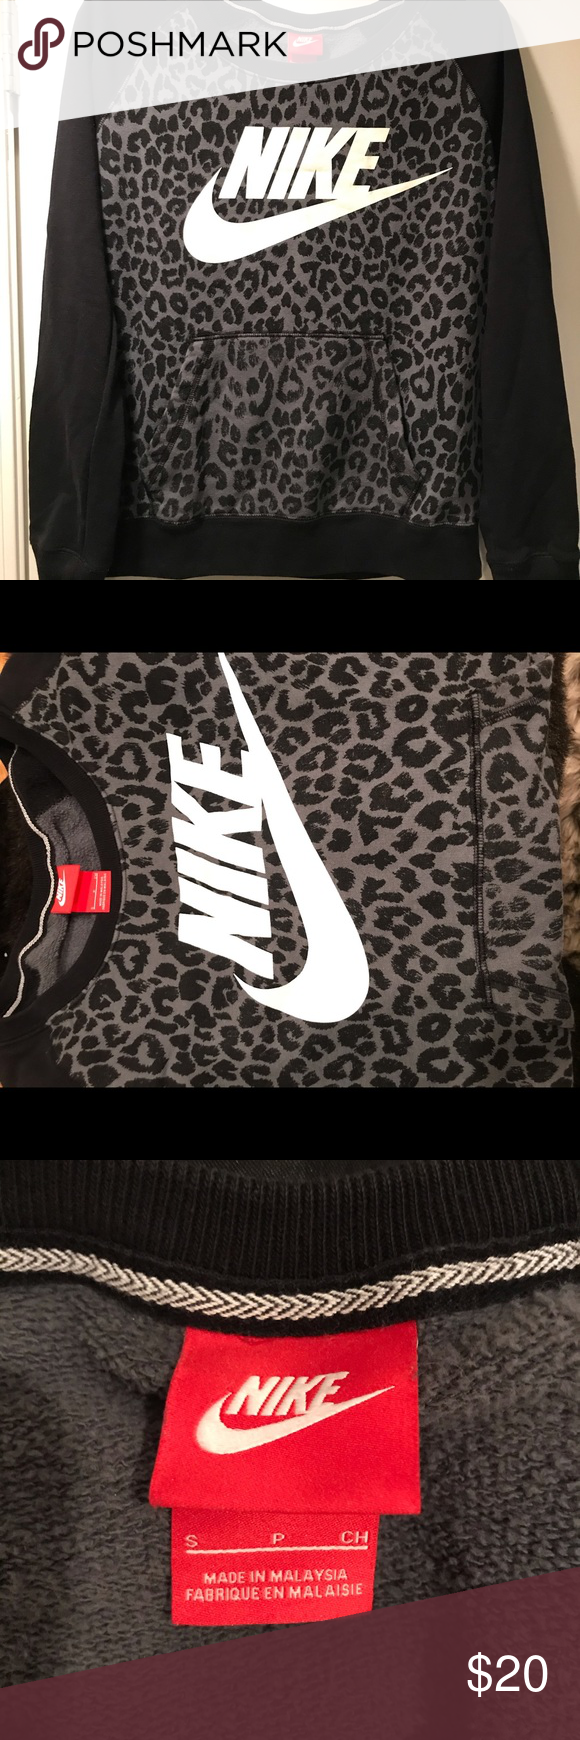 Nike Leopard Print Crewneck Sweatshirt Leopard Nikes Crew Neck Sweatshirt Grey Leopard Print [ 1740 x 580 Pixel ]